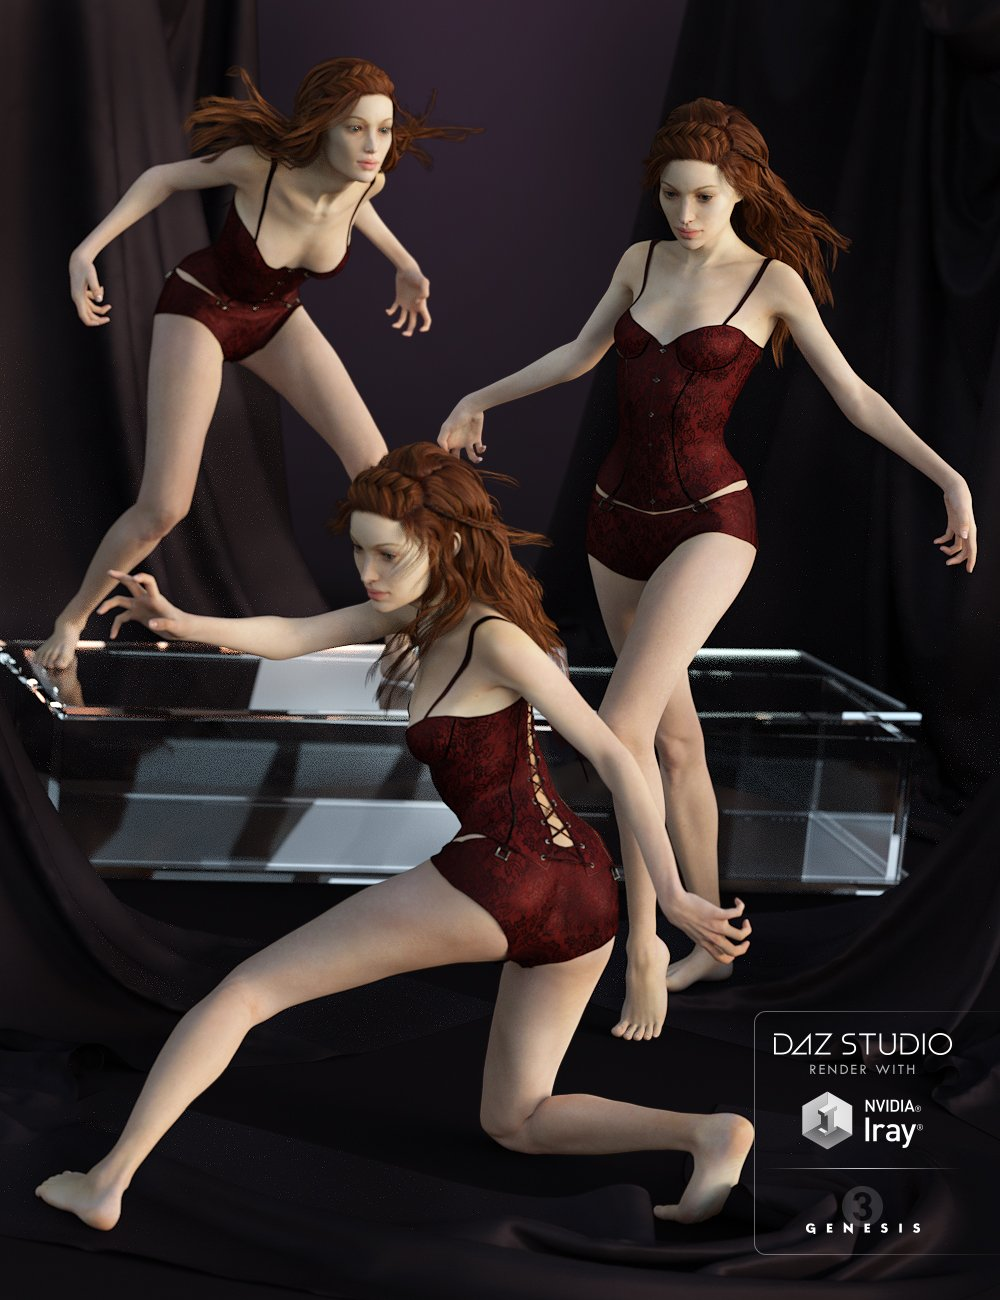 Noctem Sanguinis for Arabella 7 by: Devon, 3D Models by Daz 3D